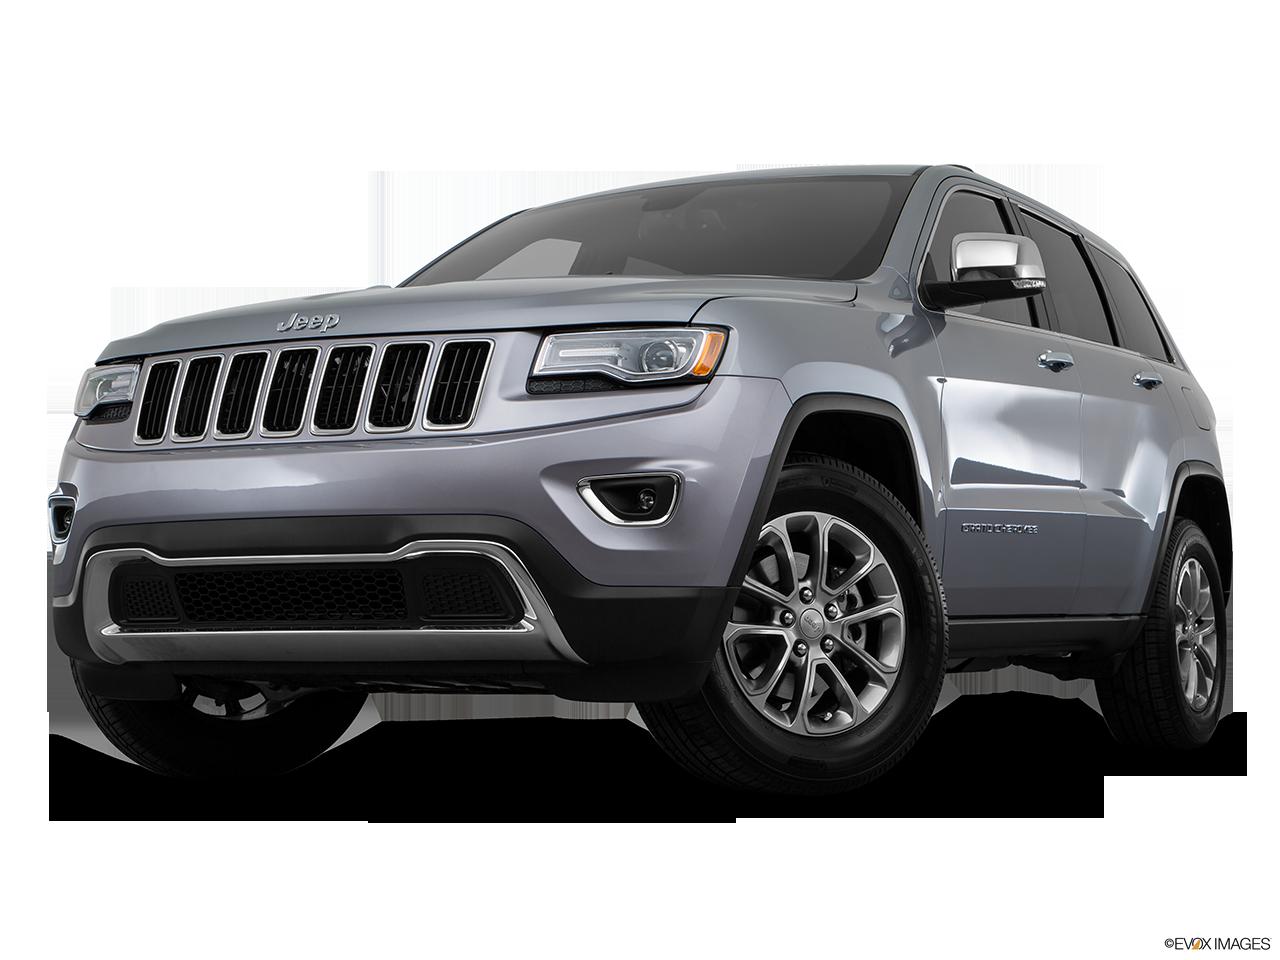 compare the 2016 jeep grand cherokee vs 2016 bmw x5 moss bros chrysler jeep dodge ram riverside. Black Bedroom Furniture Sets. Home Design Ideas